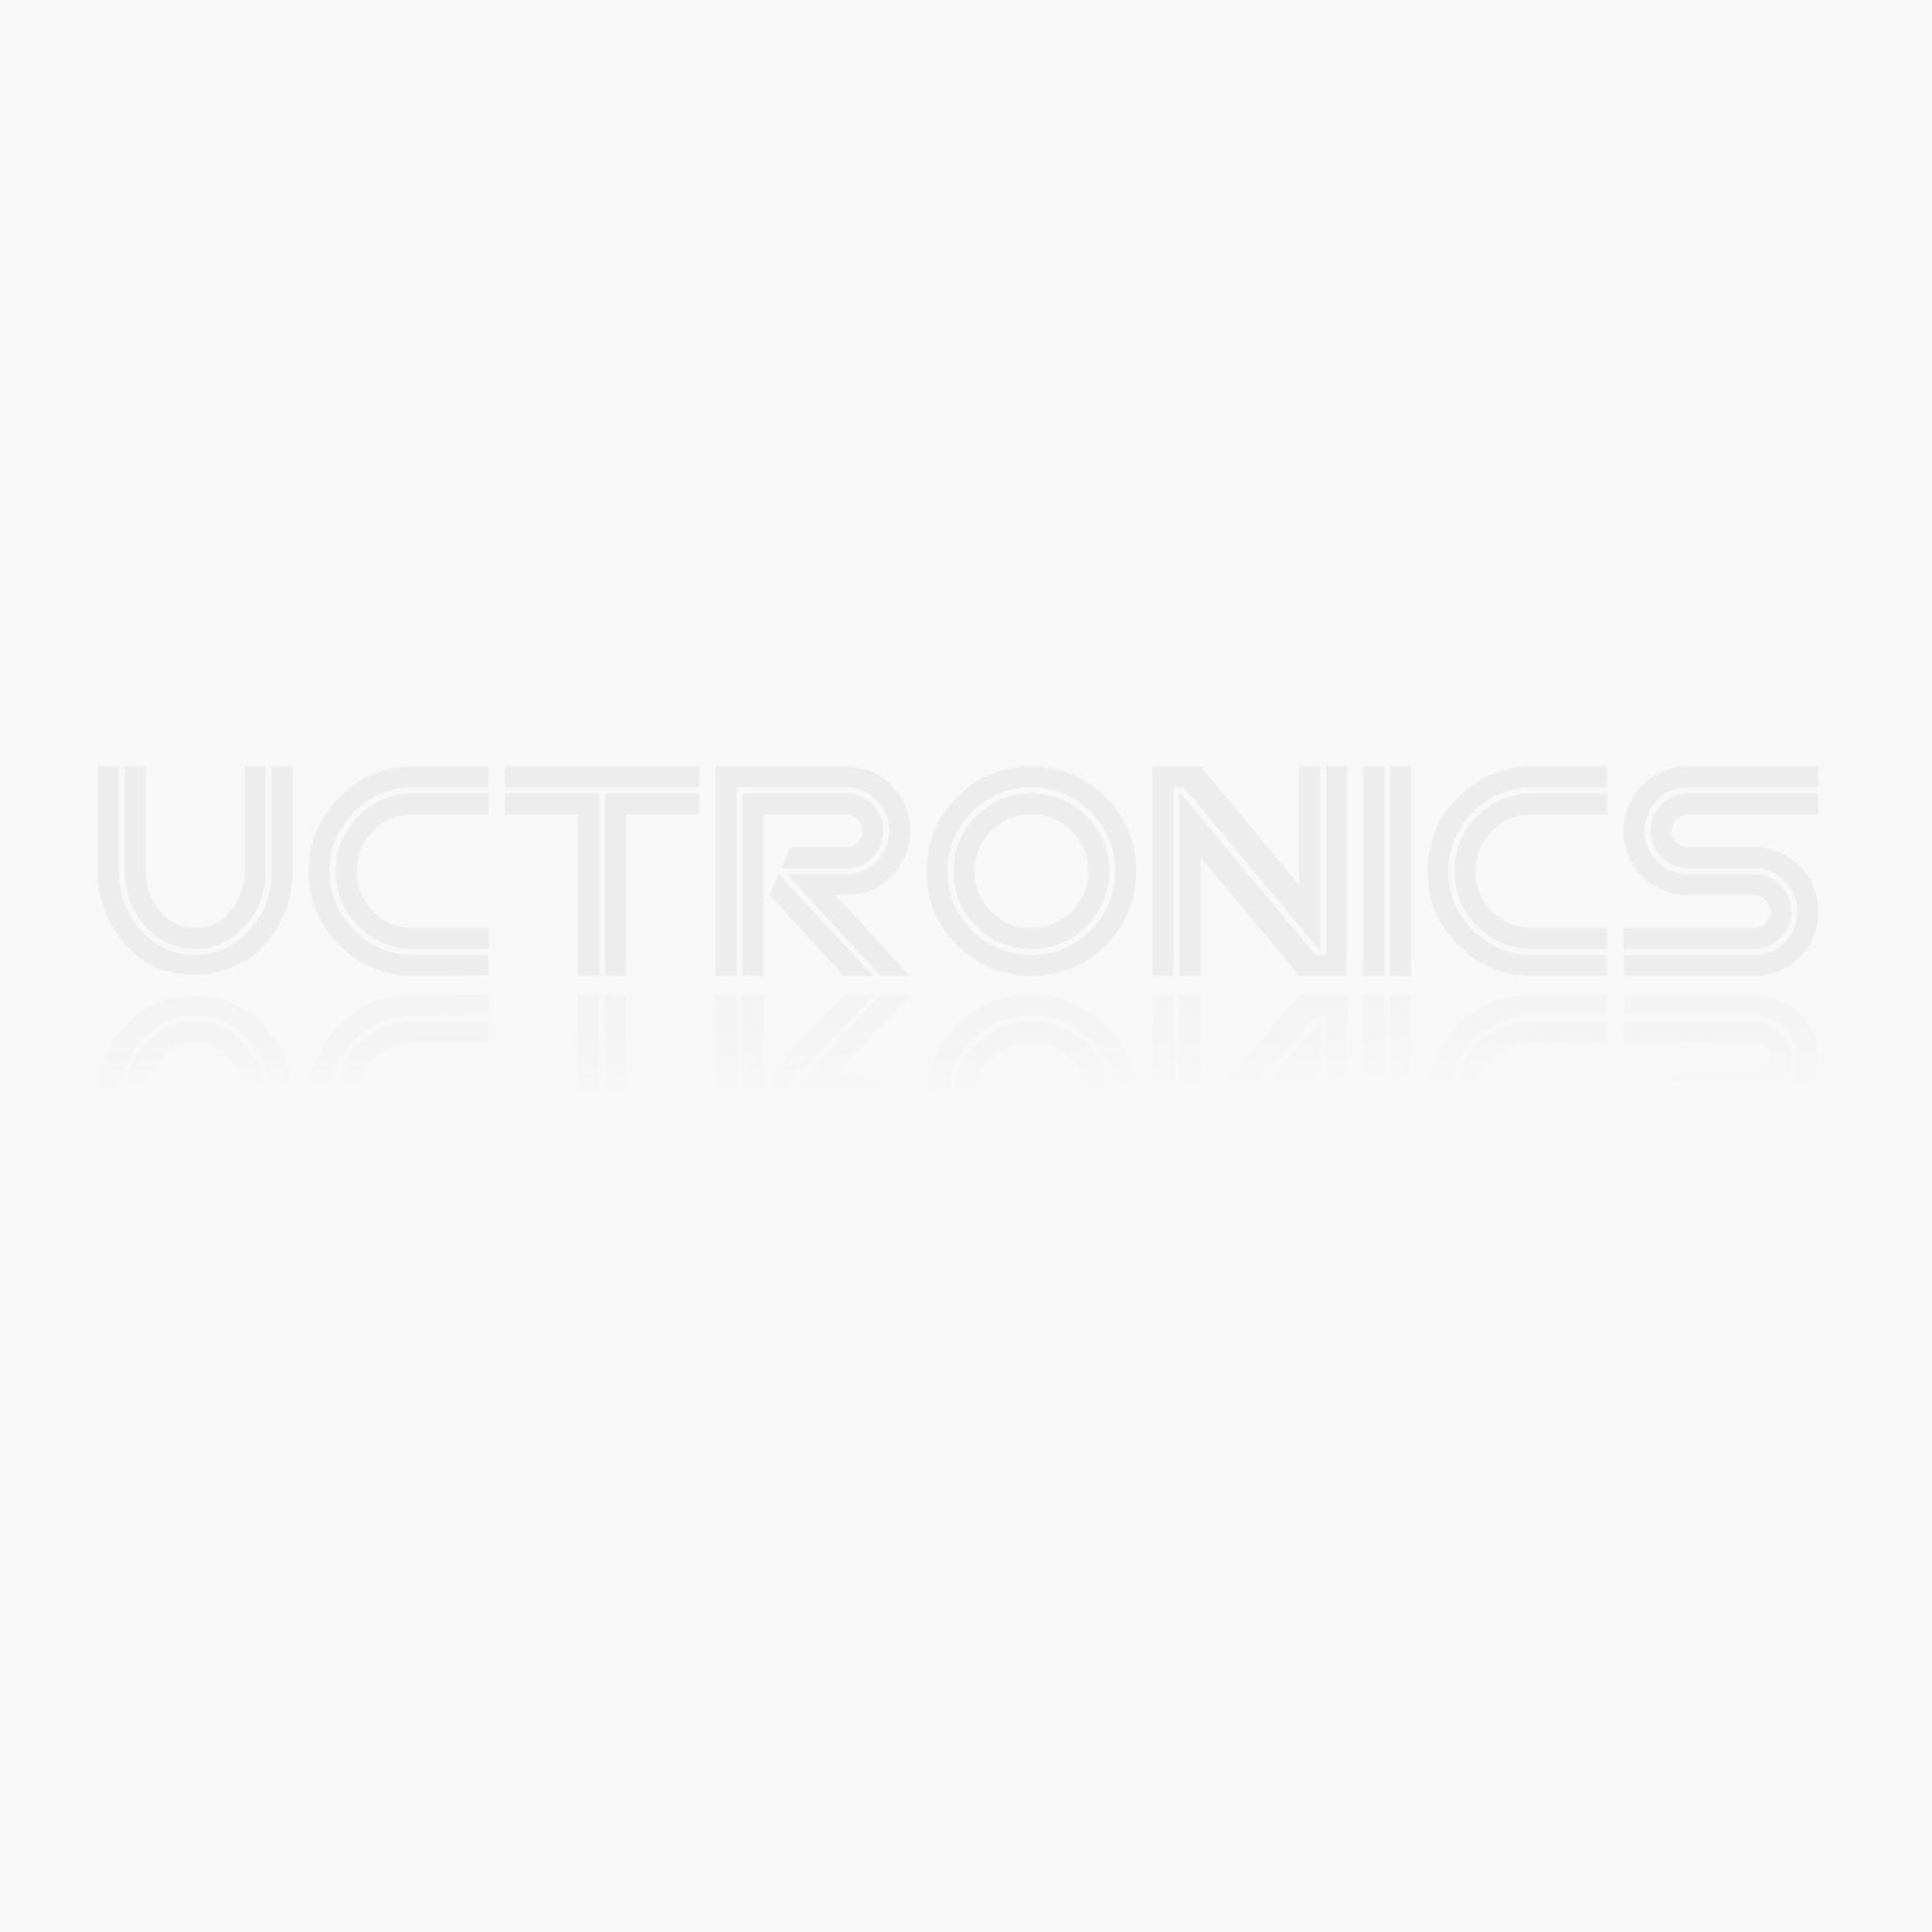 5*7cm Single Side PCB Glass Fiber Prototyping Board DIY Universal